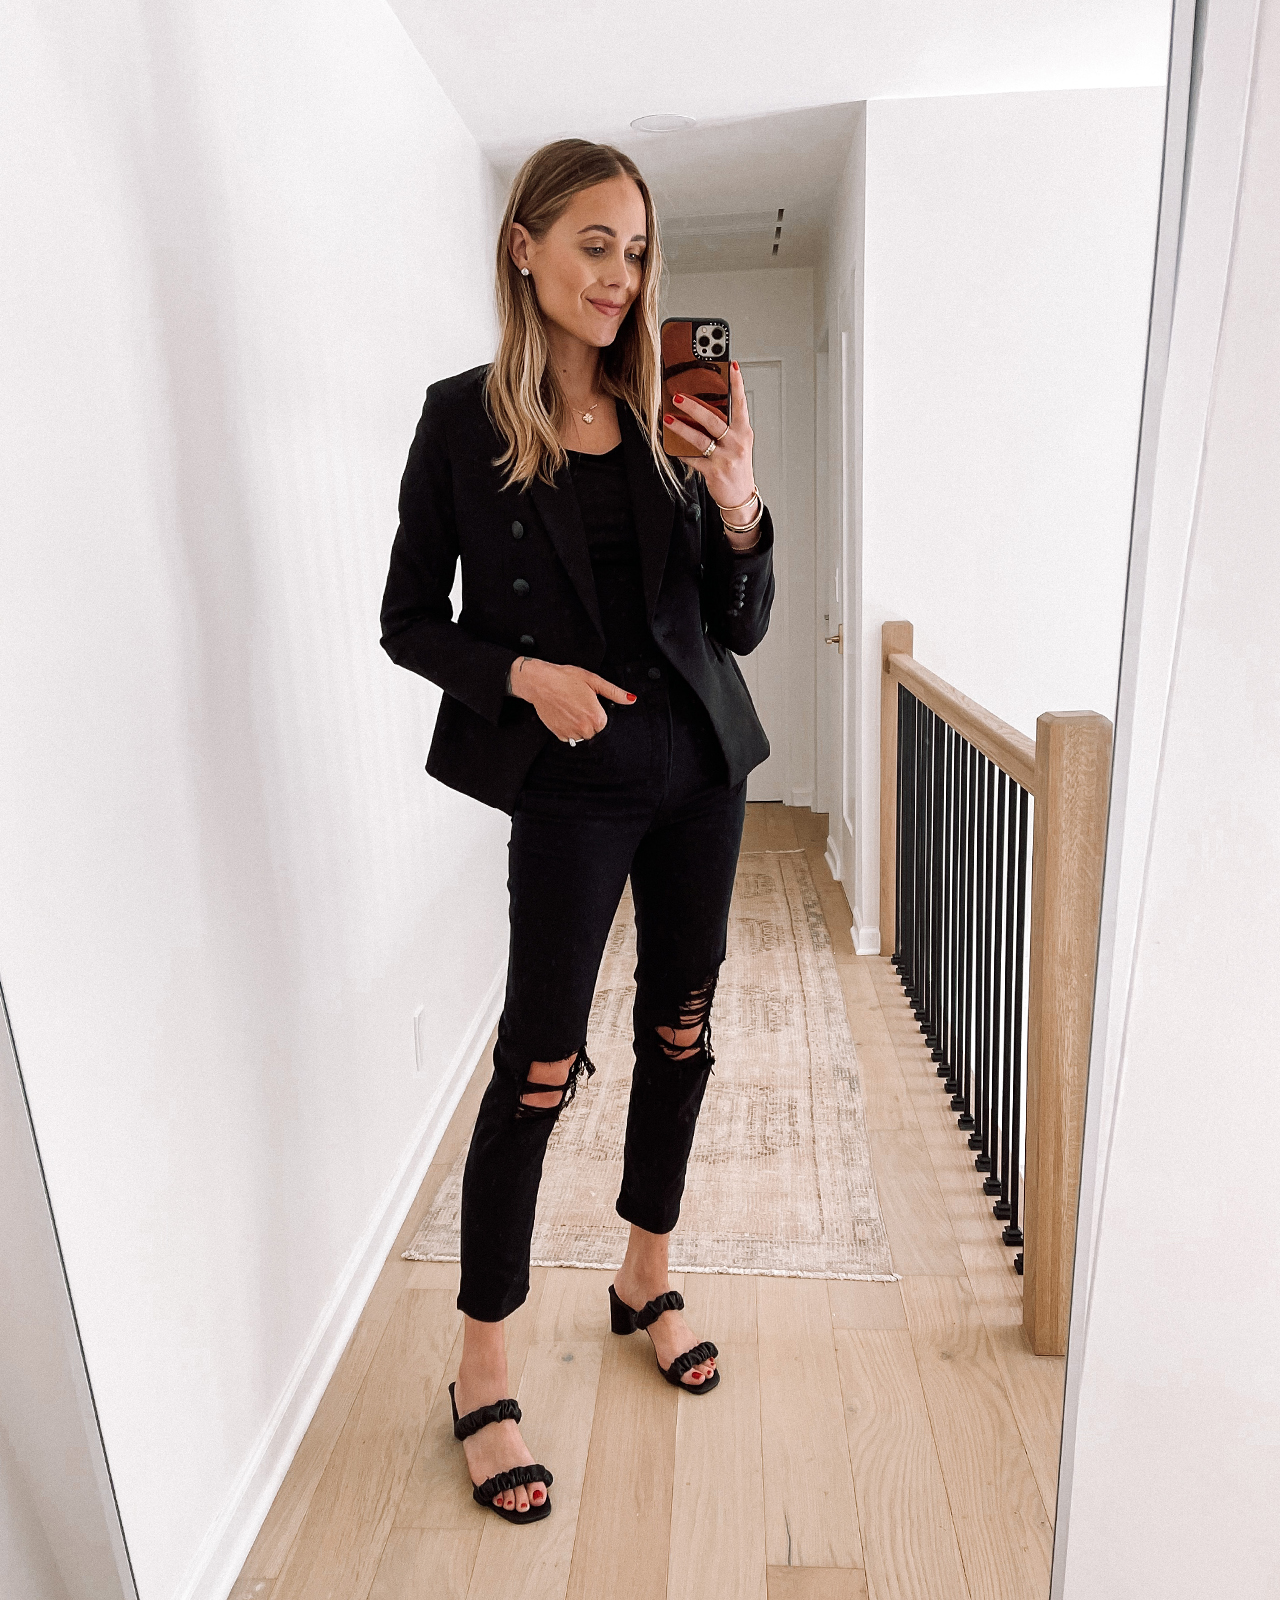 Fashion Jackson Wearing Black Blazer Black Bodysuit Black Ripped Jeans Black Sandals Express Haul